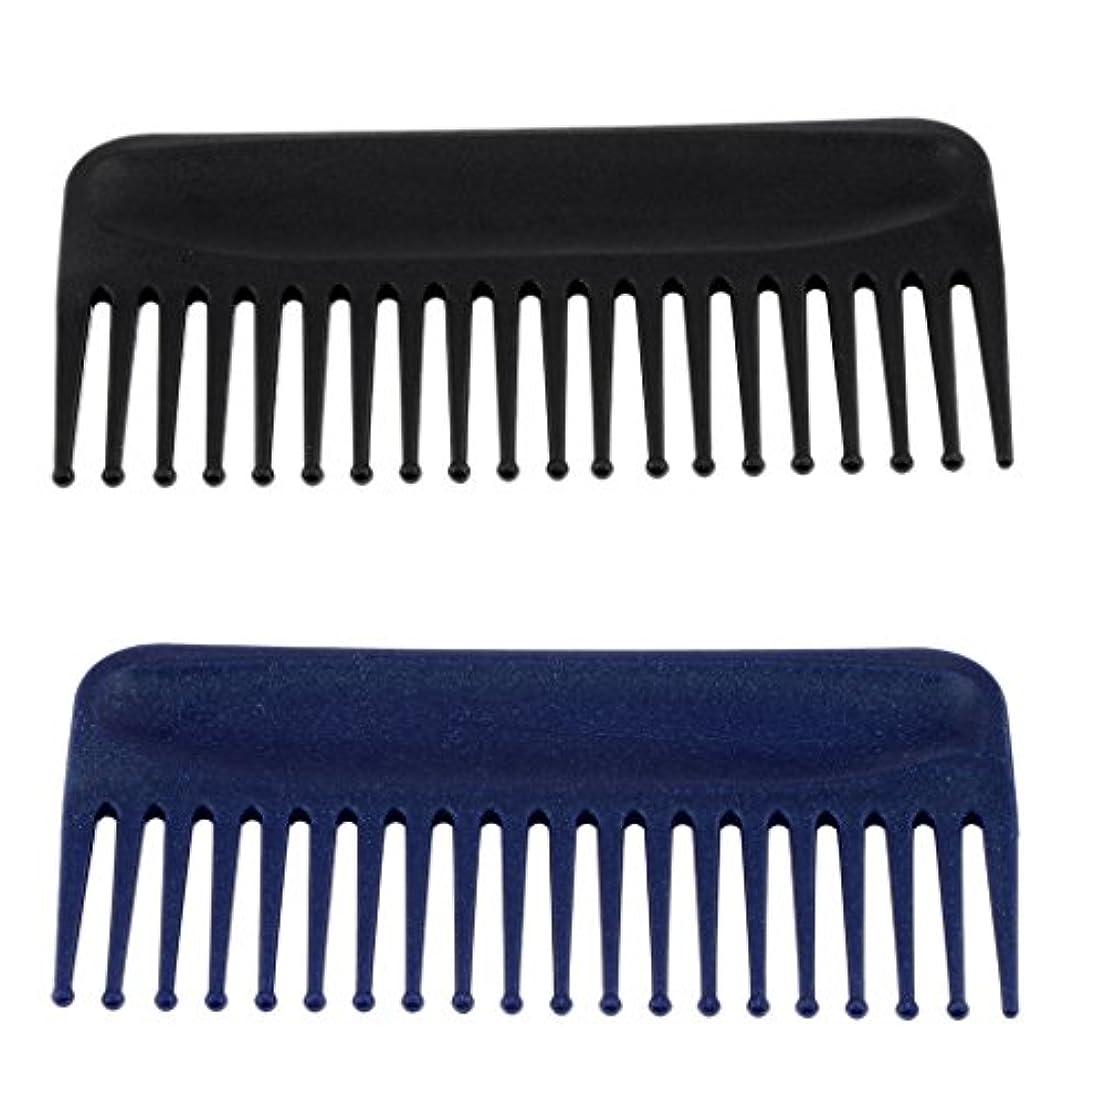 Baosity ヘアコーム くし 櫛 ヘアブラシ  頭皮マッサージ 静電気防止 美髪ケア 快適 プラスチック製 2個